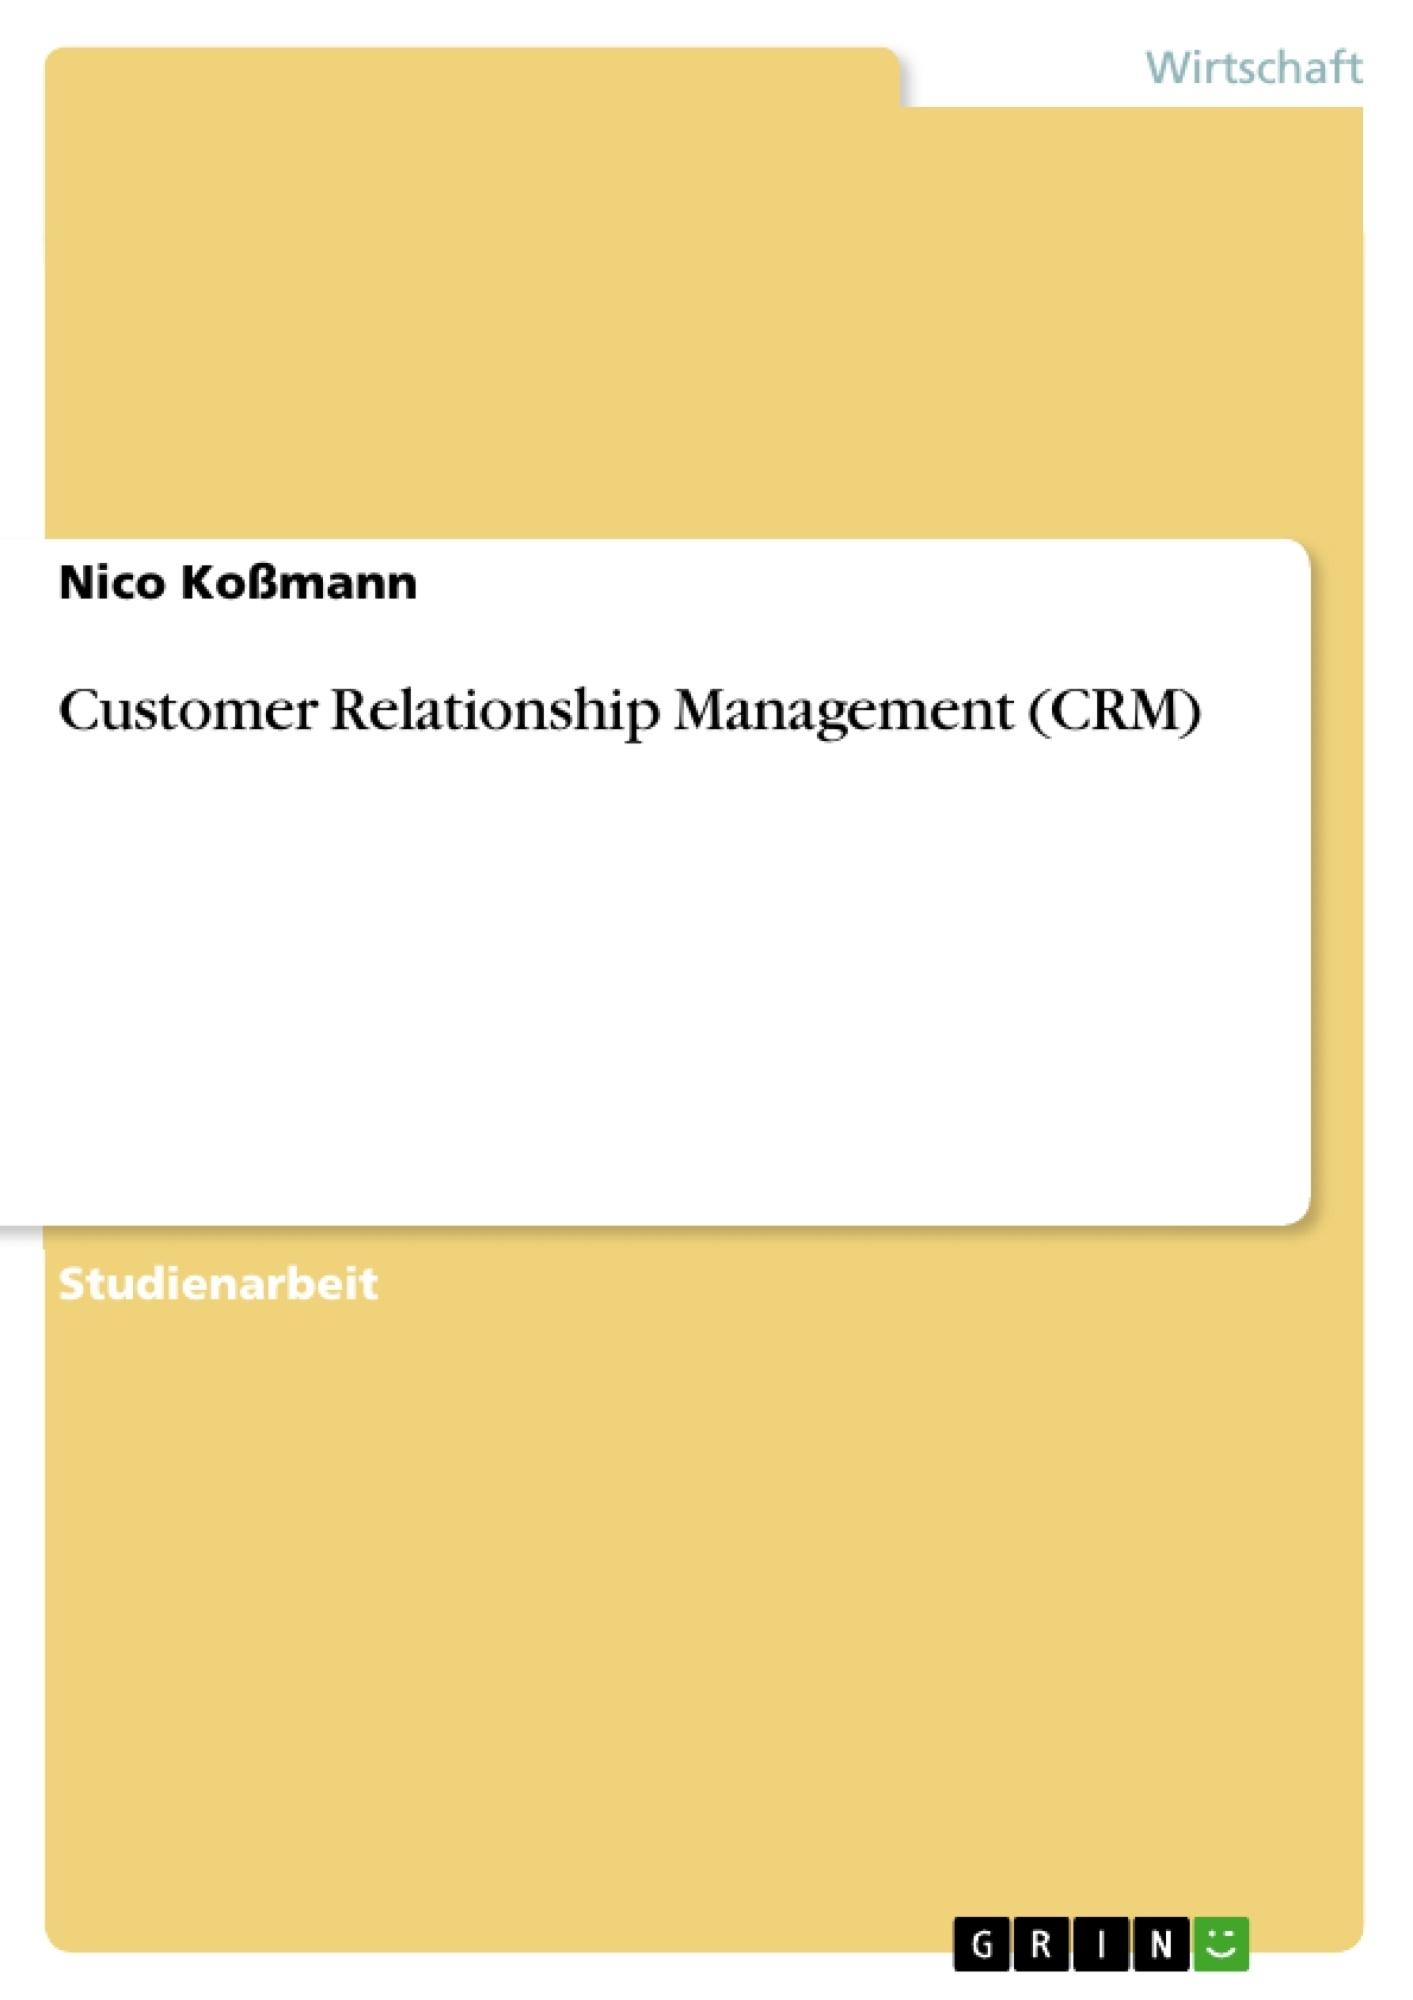 Titel: Customer Relationship Management (CRM)